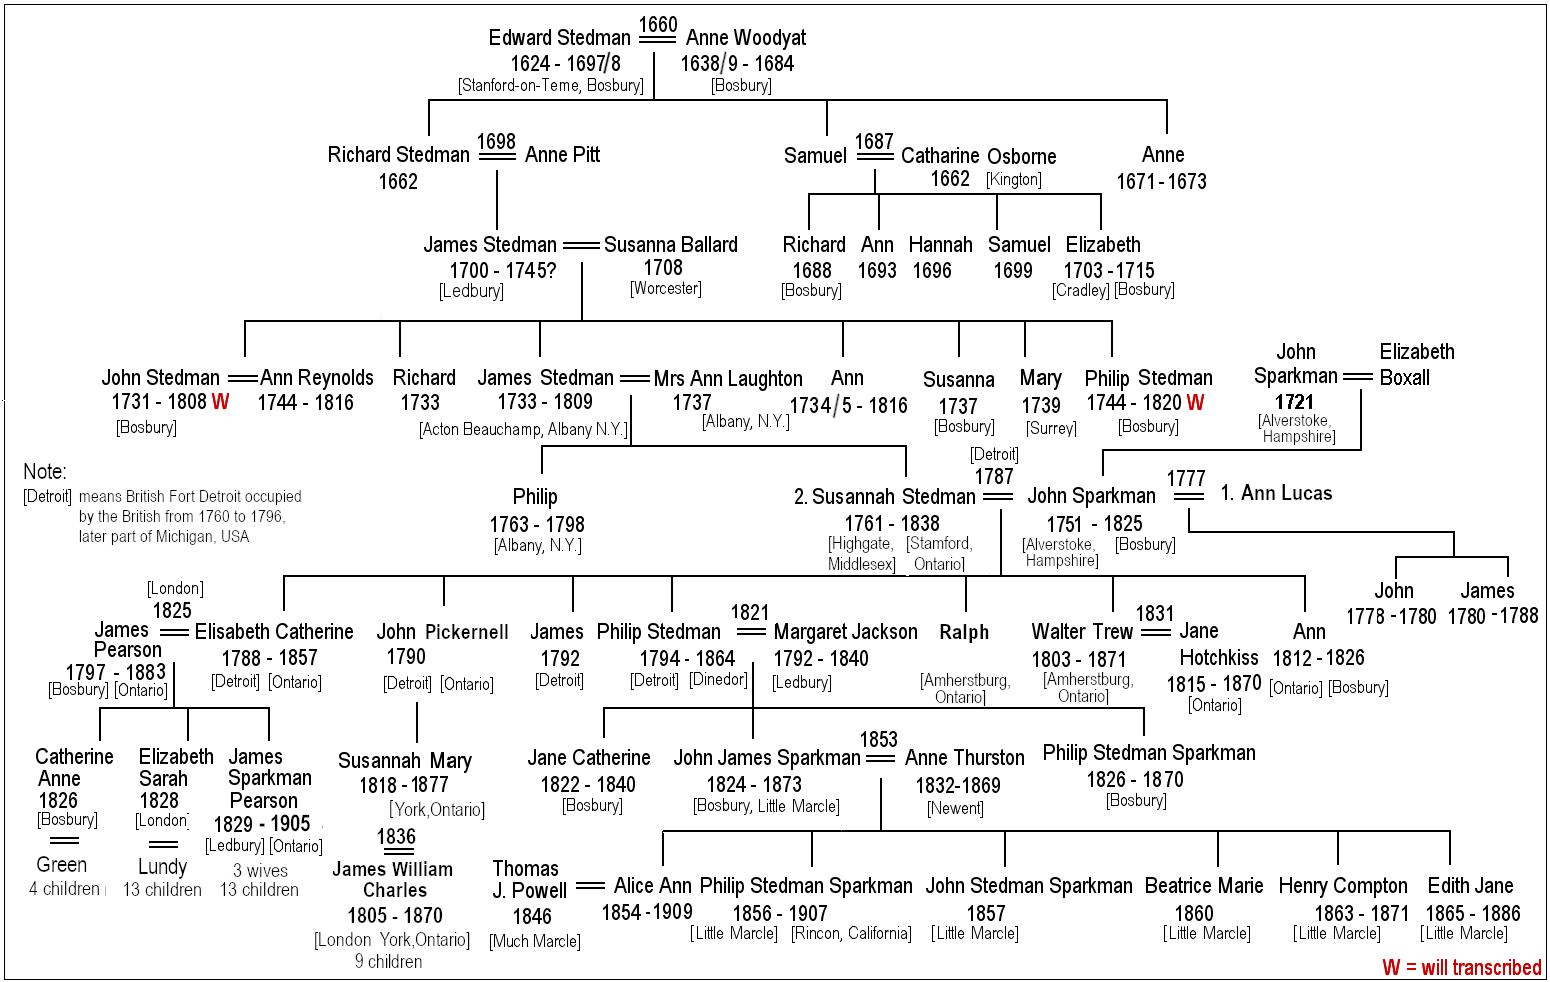 bosbury family trees